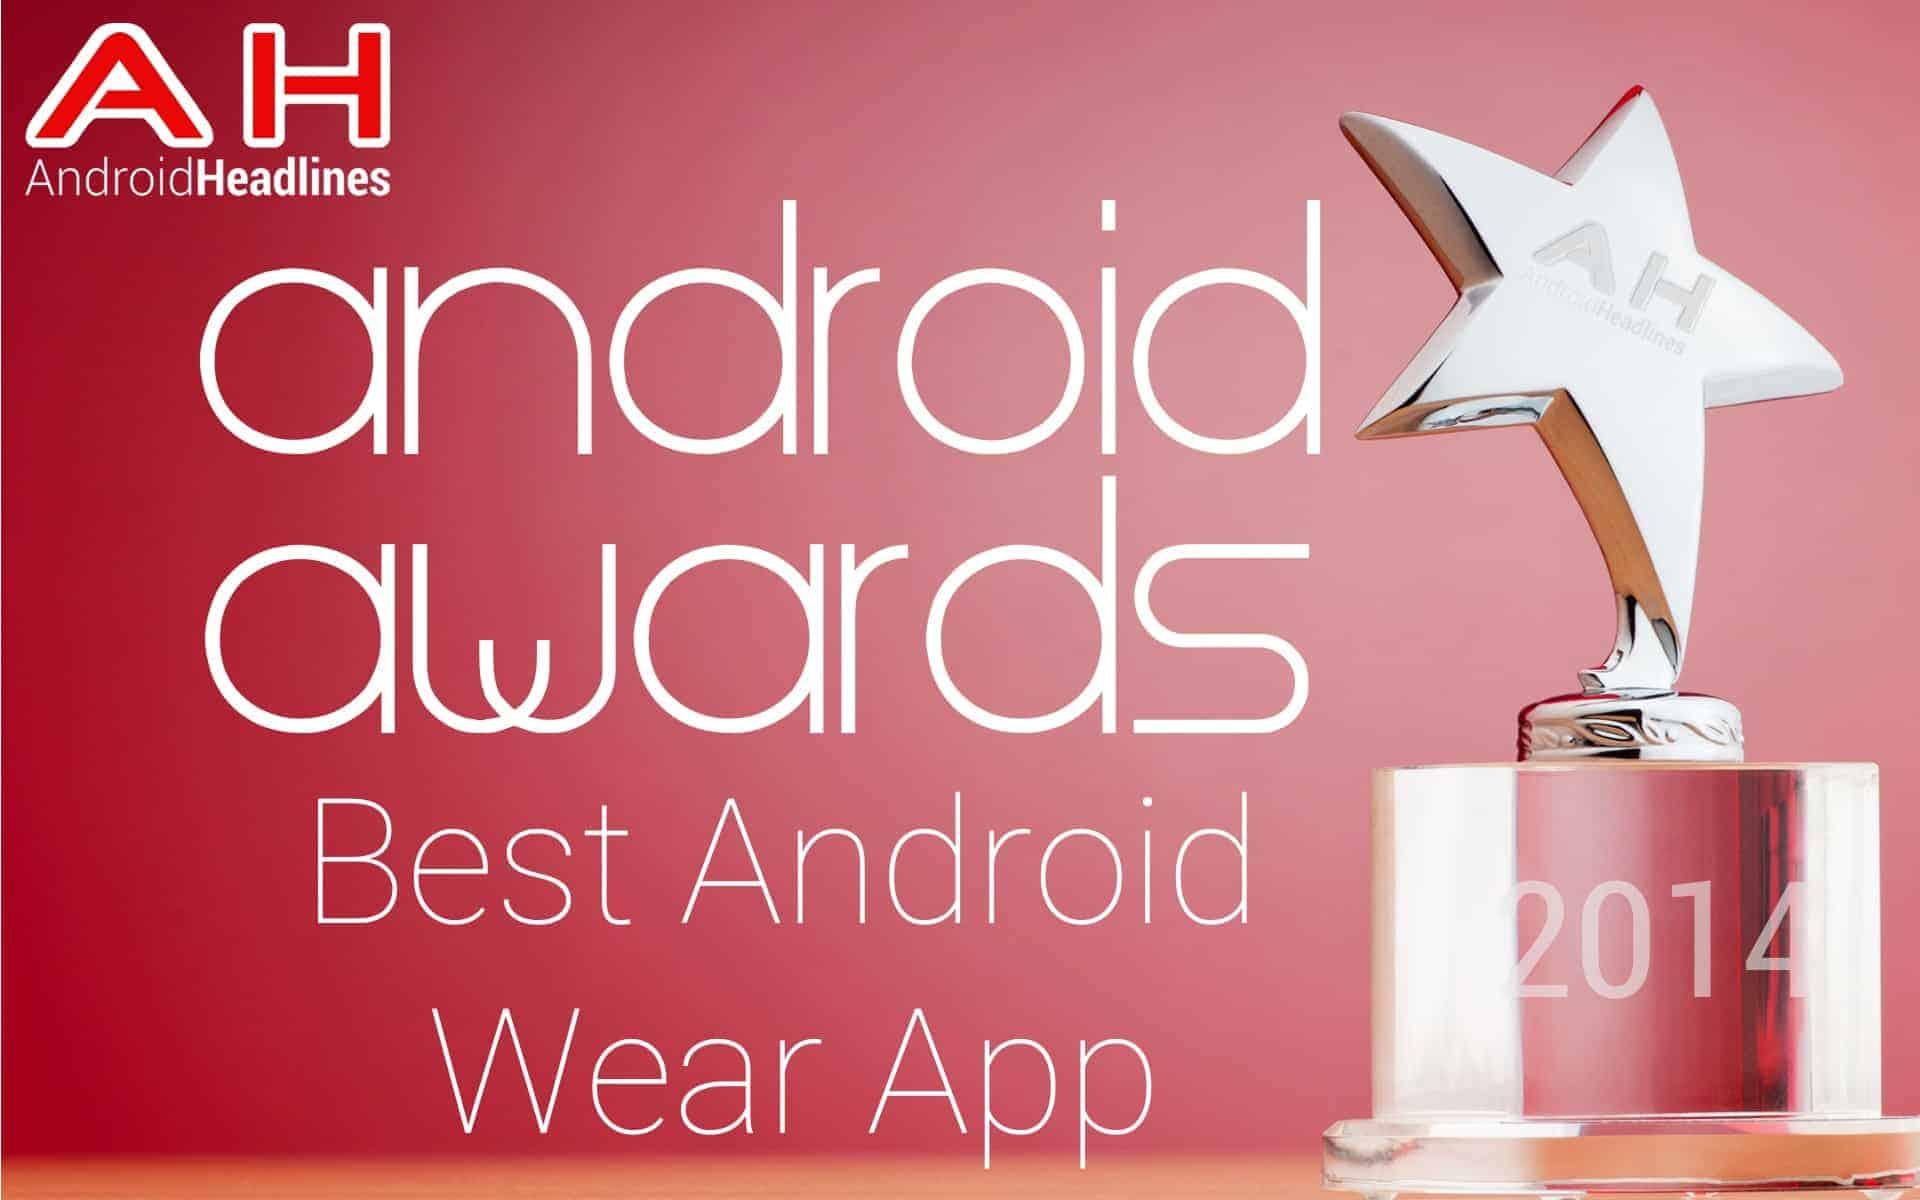 AH Awards 2015 Best Android Wear App